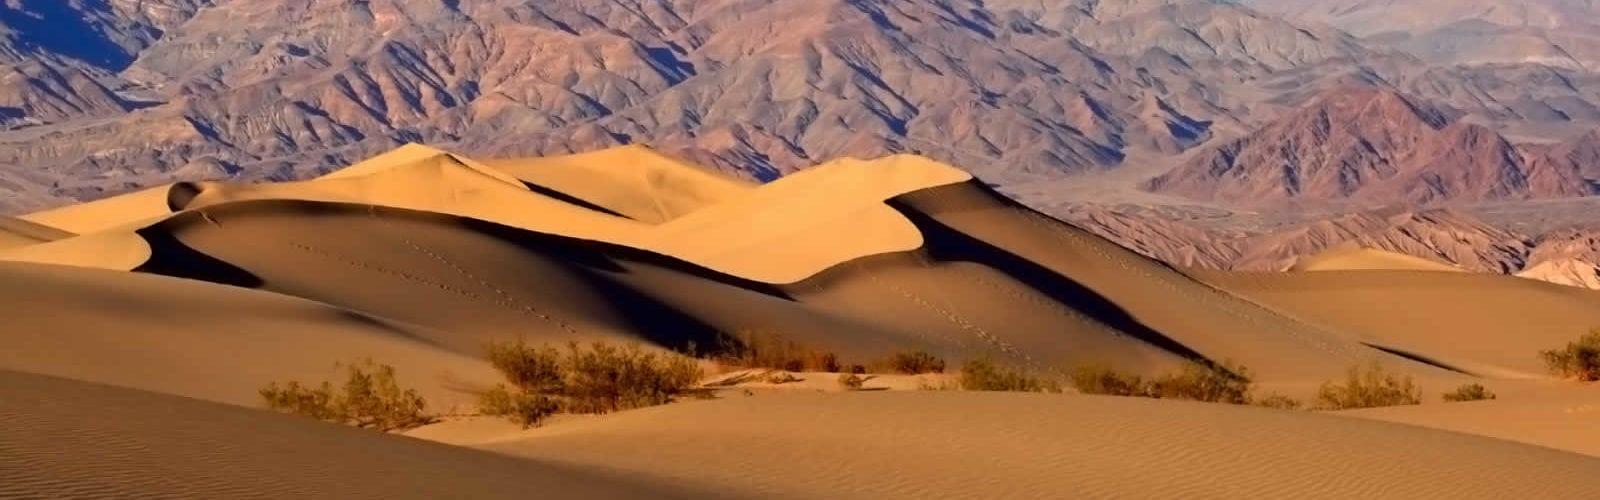 weekend-death-valley-californie-nevada-parc-national-usa-ubehebe-crater-une